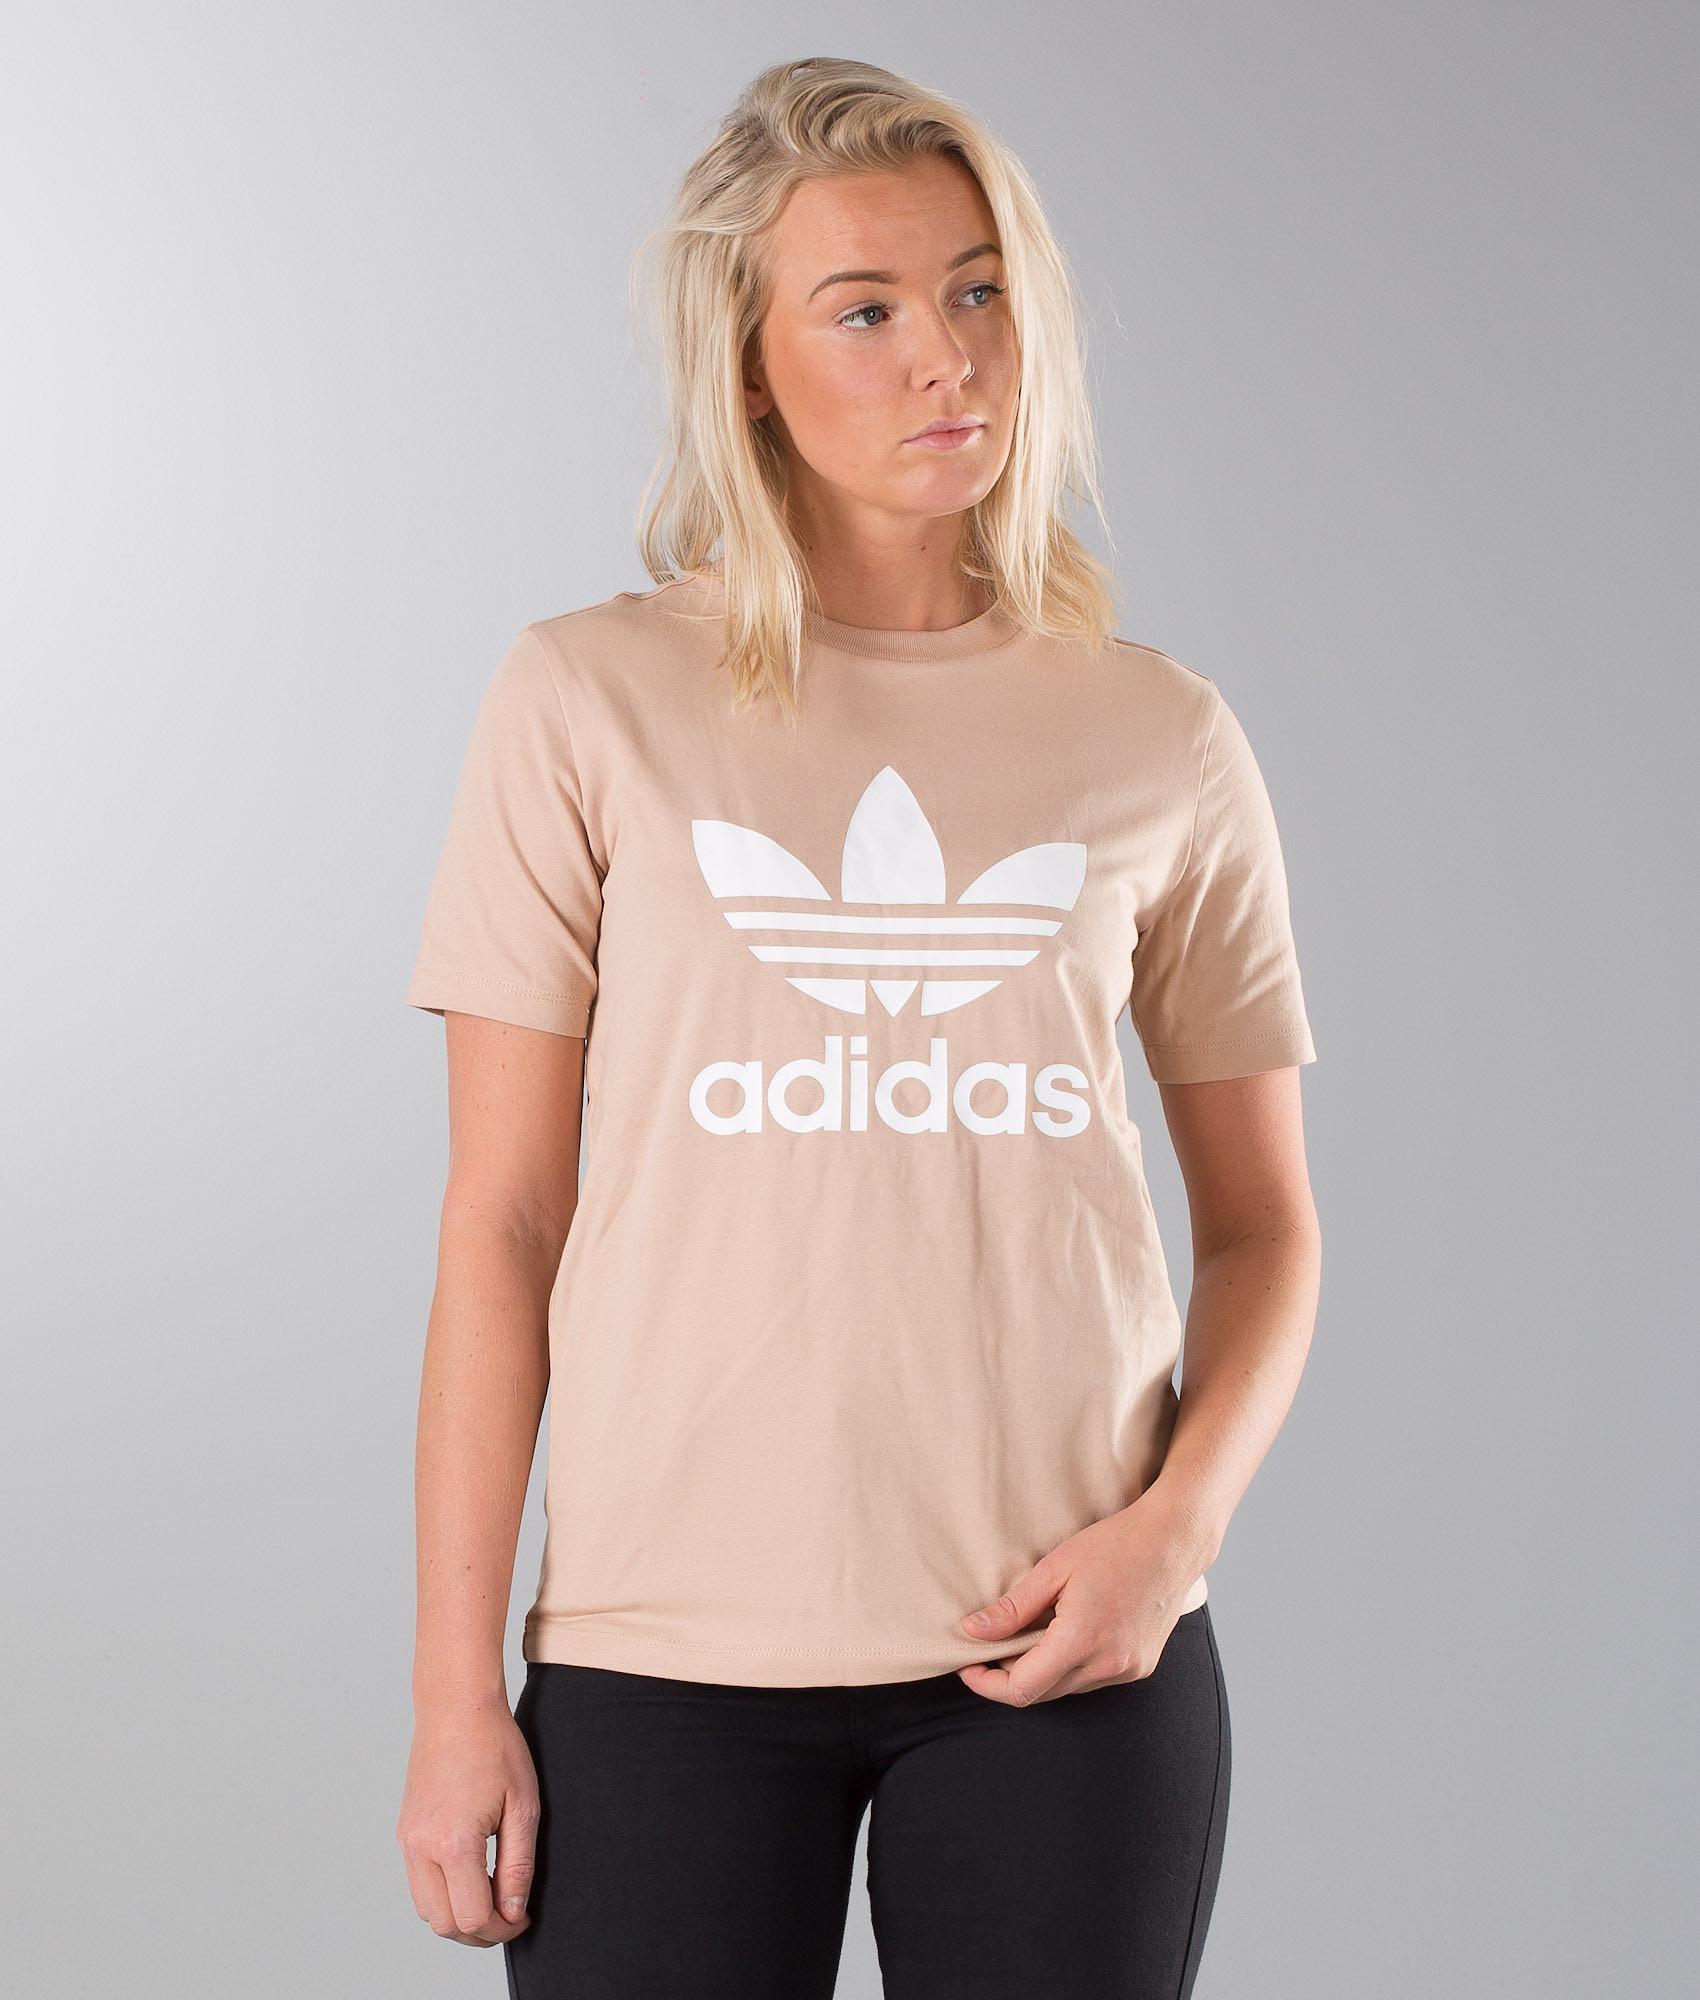 aa7828e18 Adidas Originals Trefoil T-shirt Ash Pearl/White - Ridestore.com